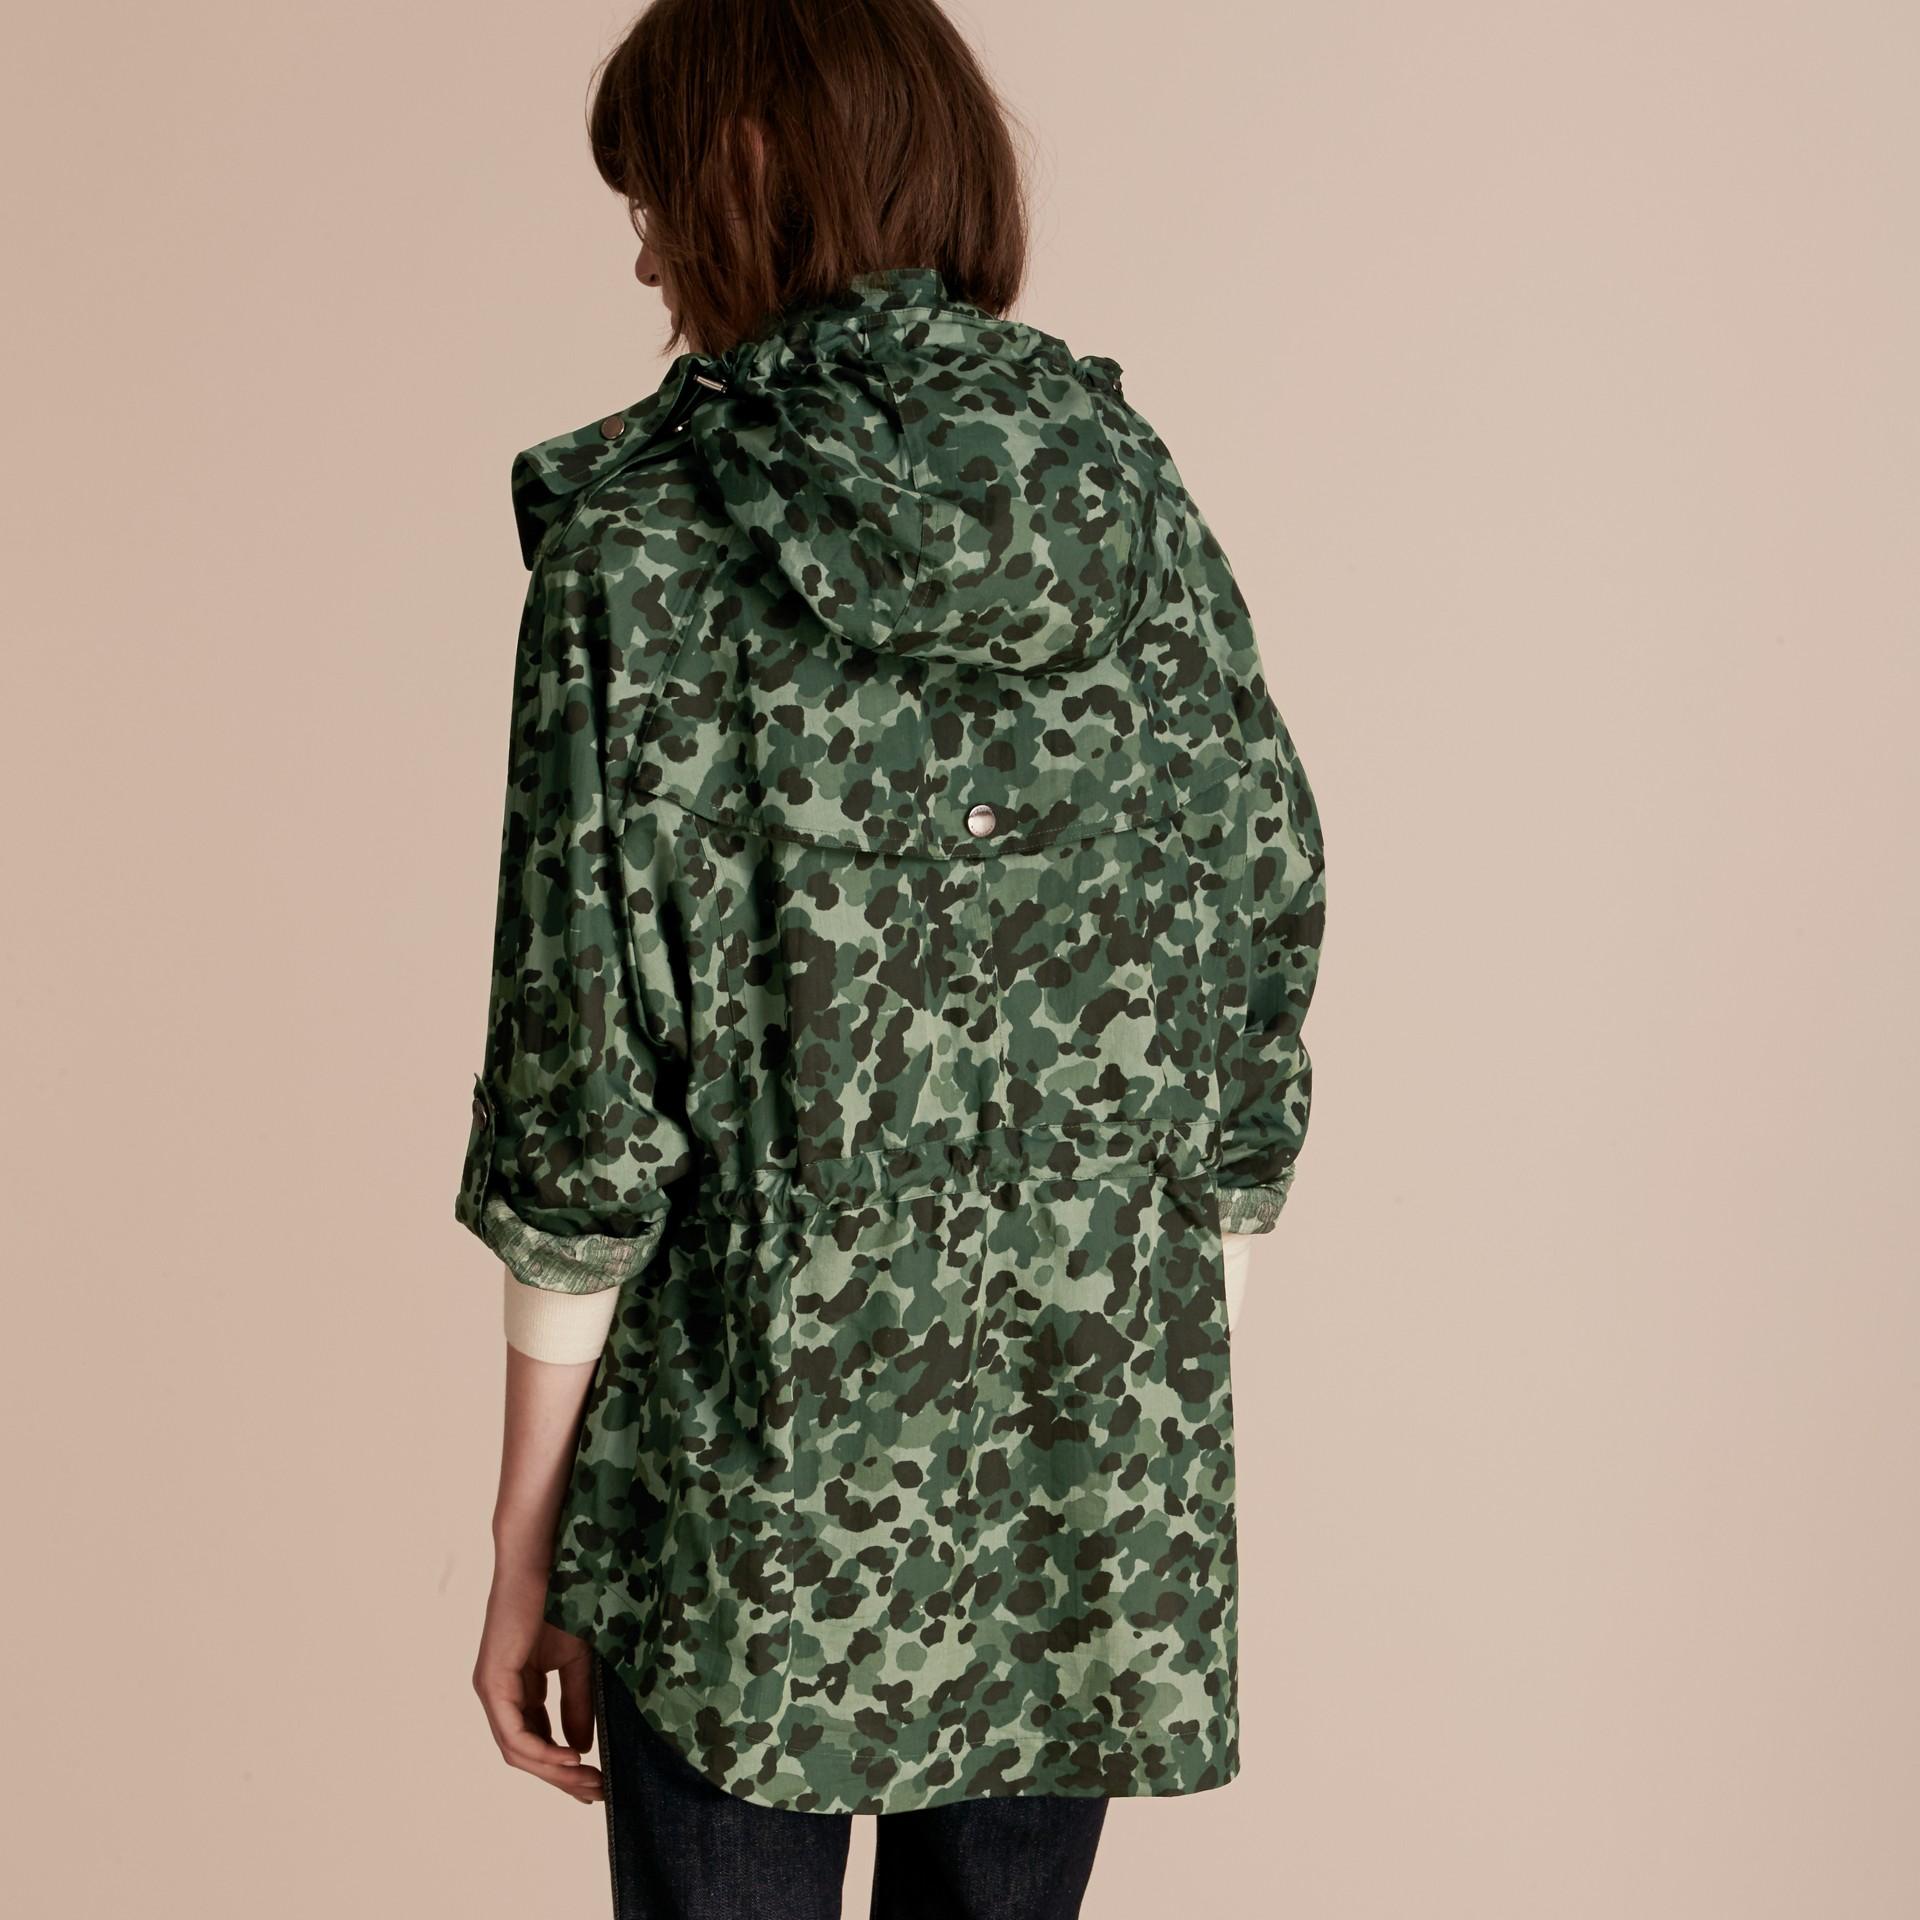 Deep bottle green Showerproof Cotton Parka Jacket with Packaway Hood - gallery image 3